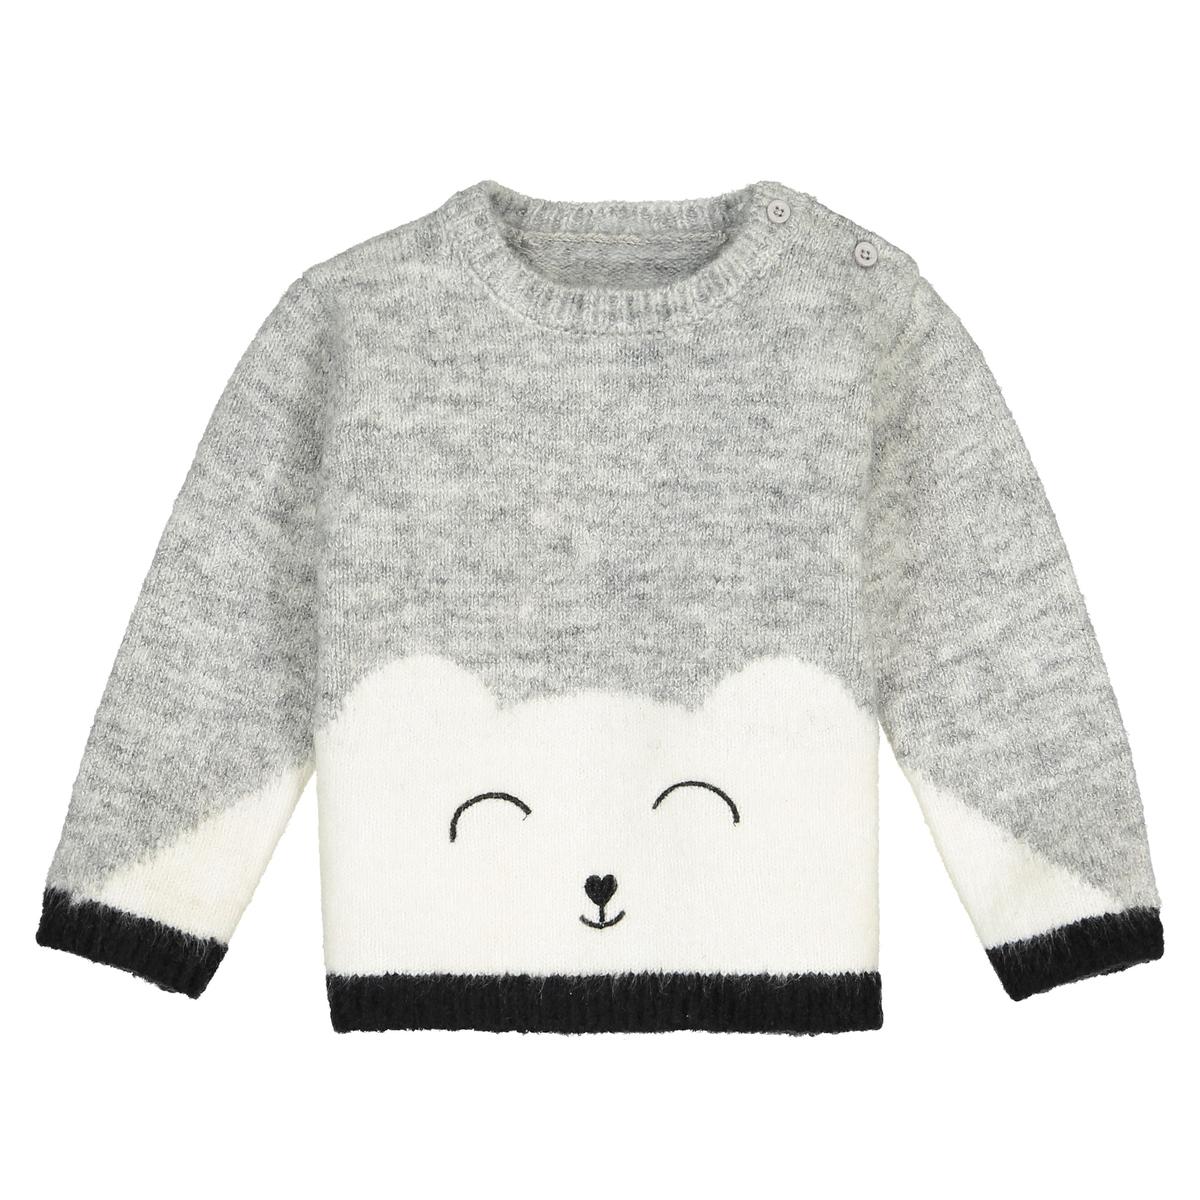 Пуловер с рисунком медведь из тонкого трикотажа, 1 мес. - 3 года комбинезон с шортами с тропическим рисунком на 1 мес 3 года